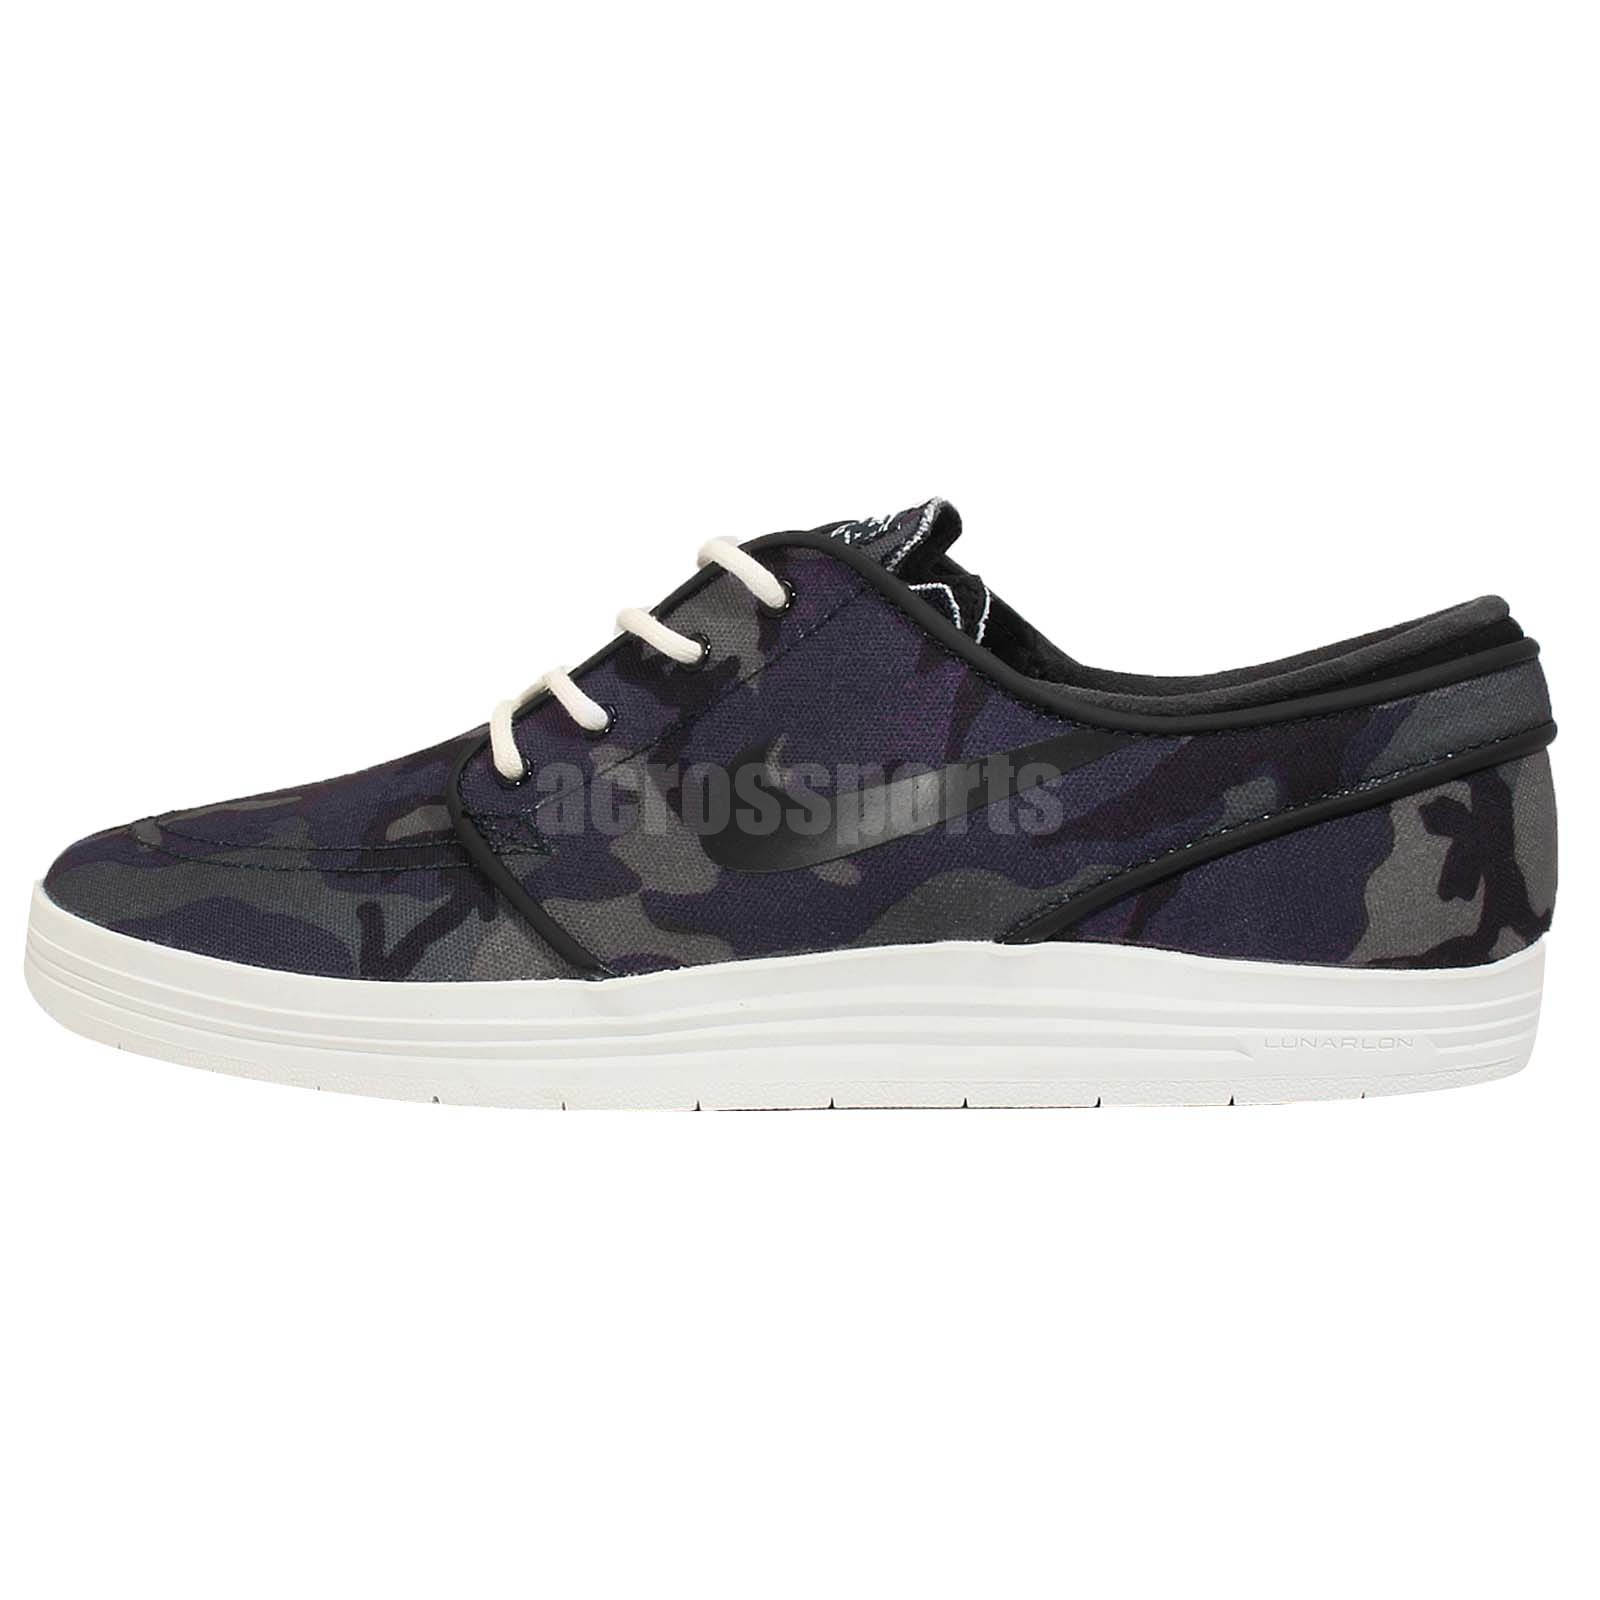 Nike Sb Shoes Janoski Lunar Camo